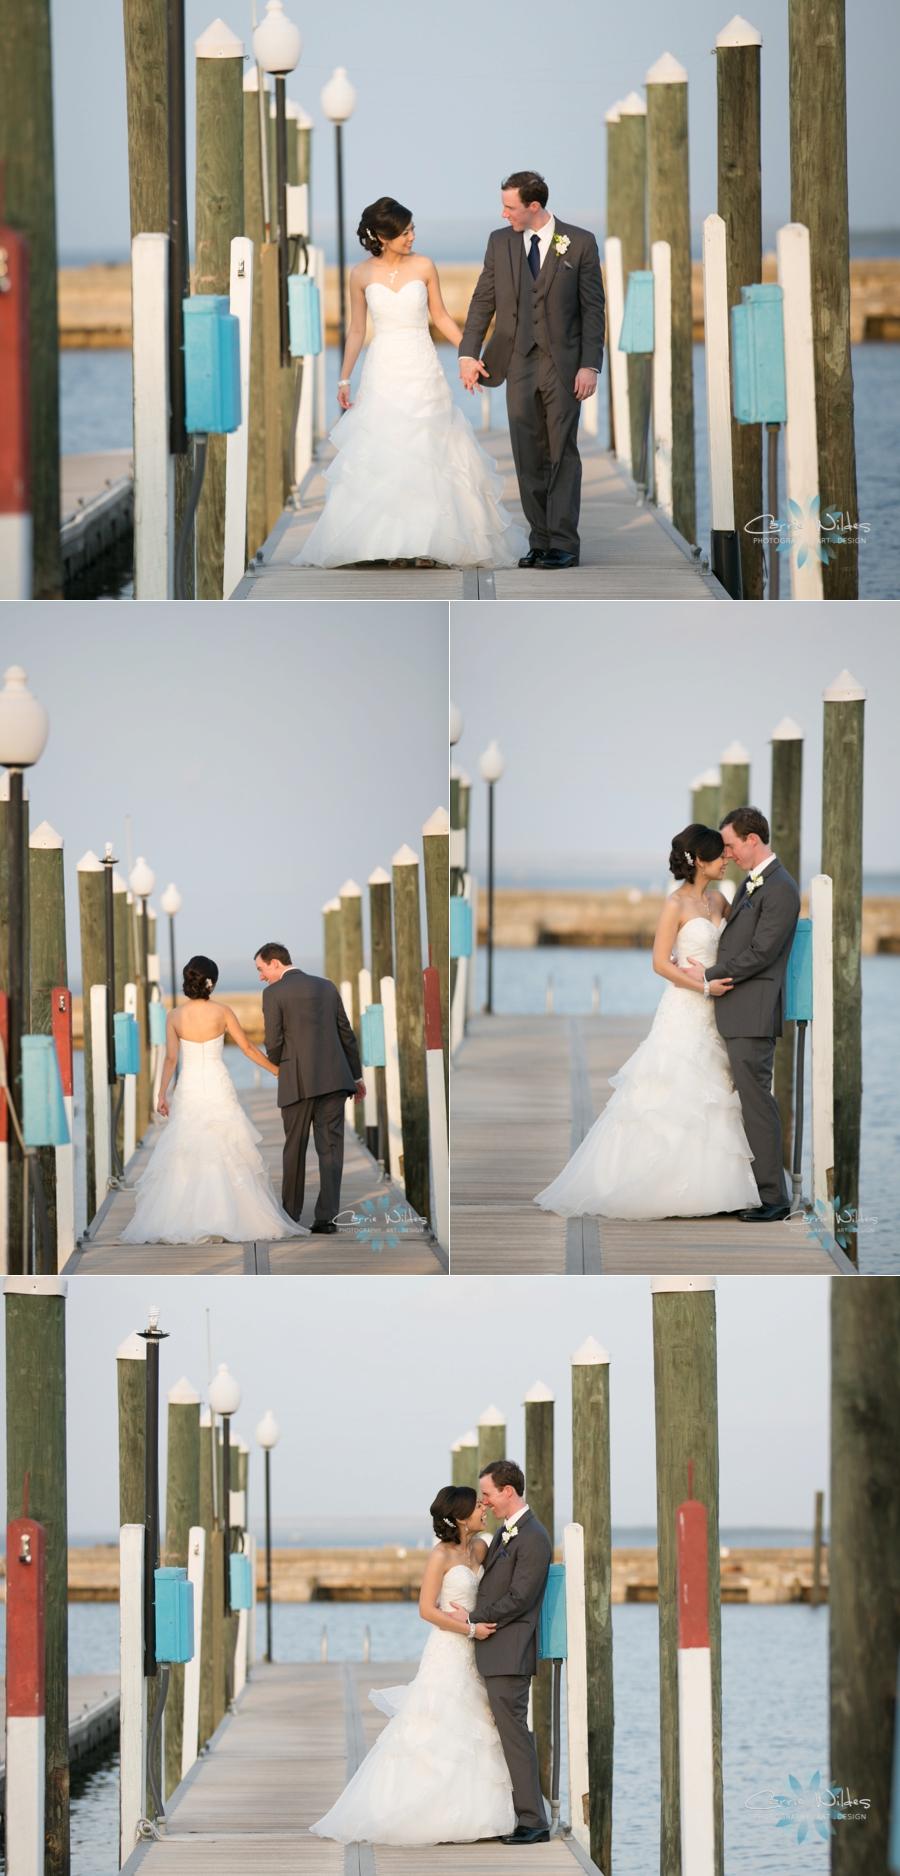 4_25_15 Tampa Yacht Club Wedding_0040.jpg